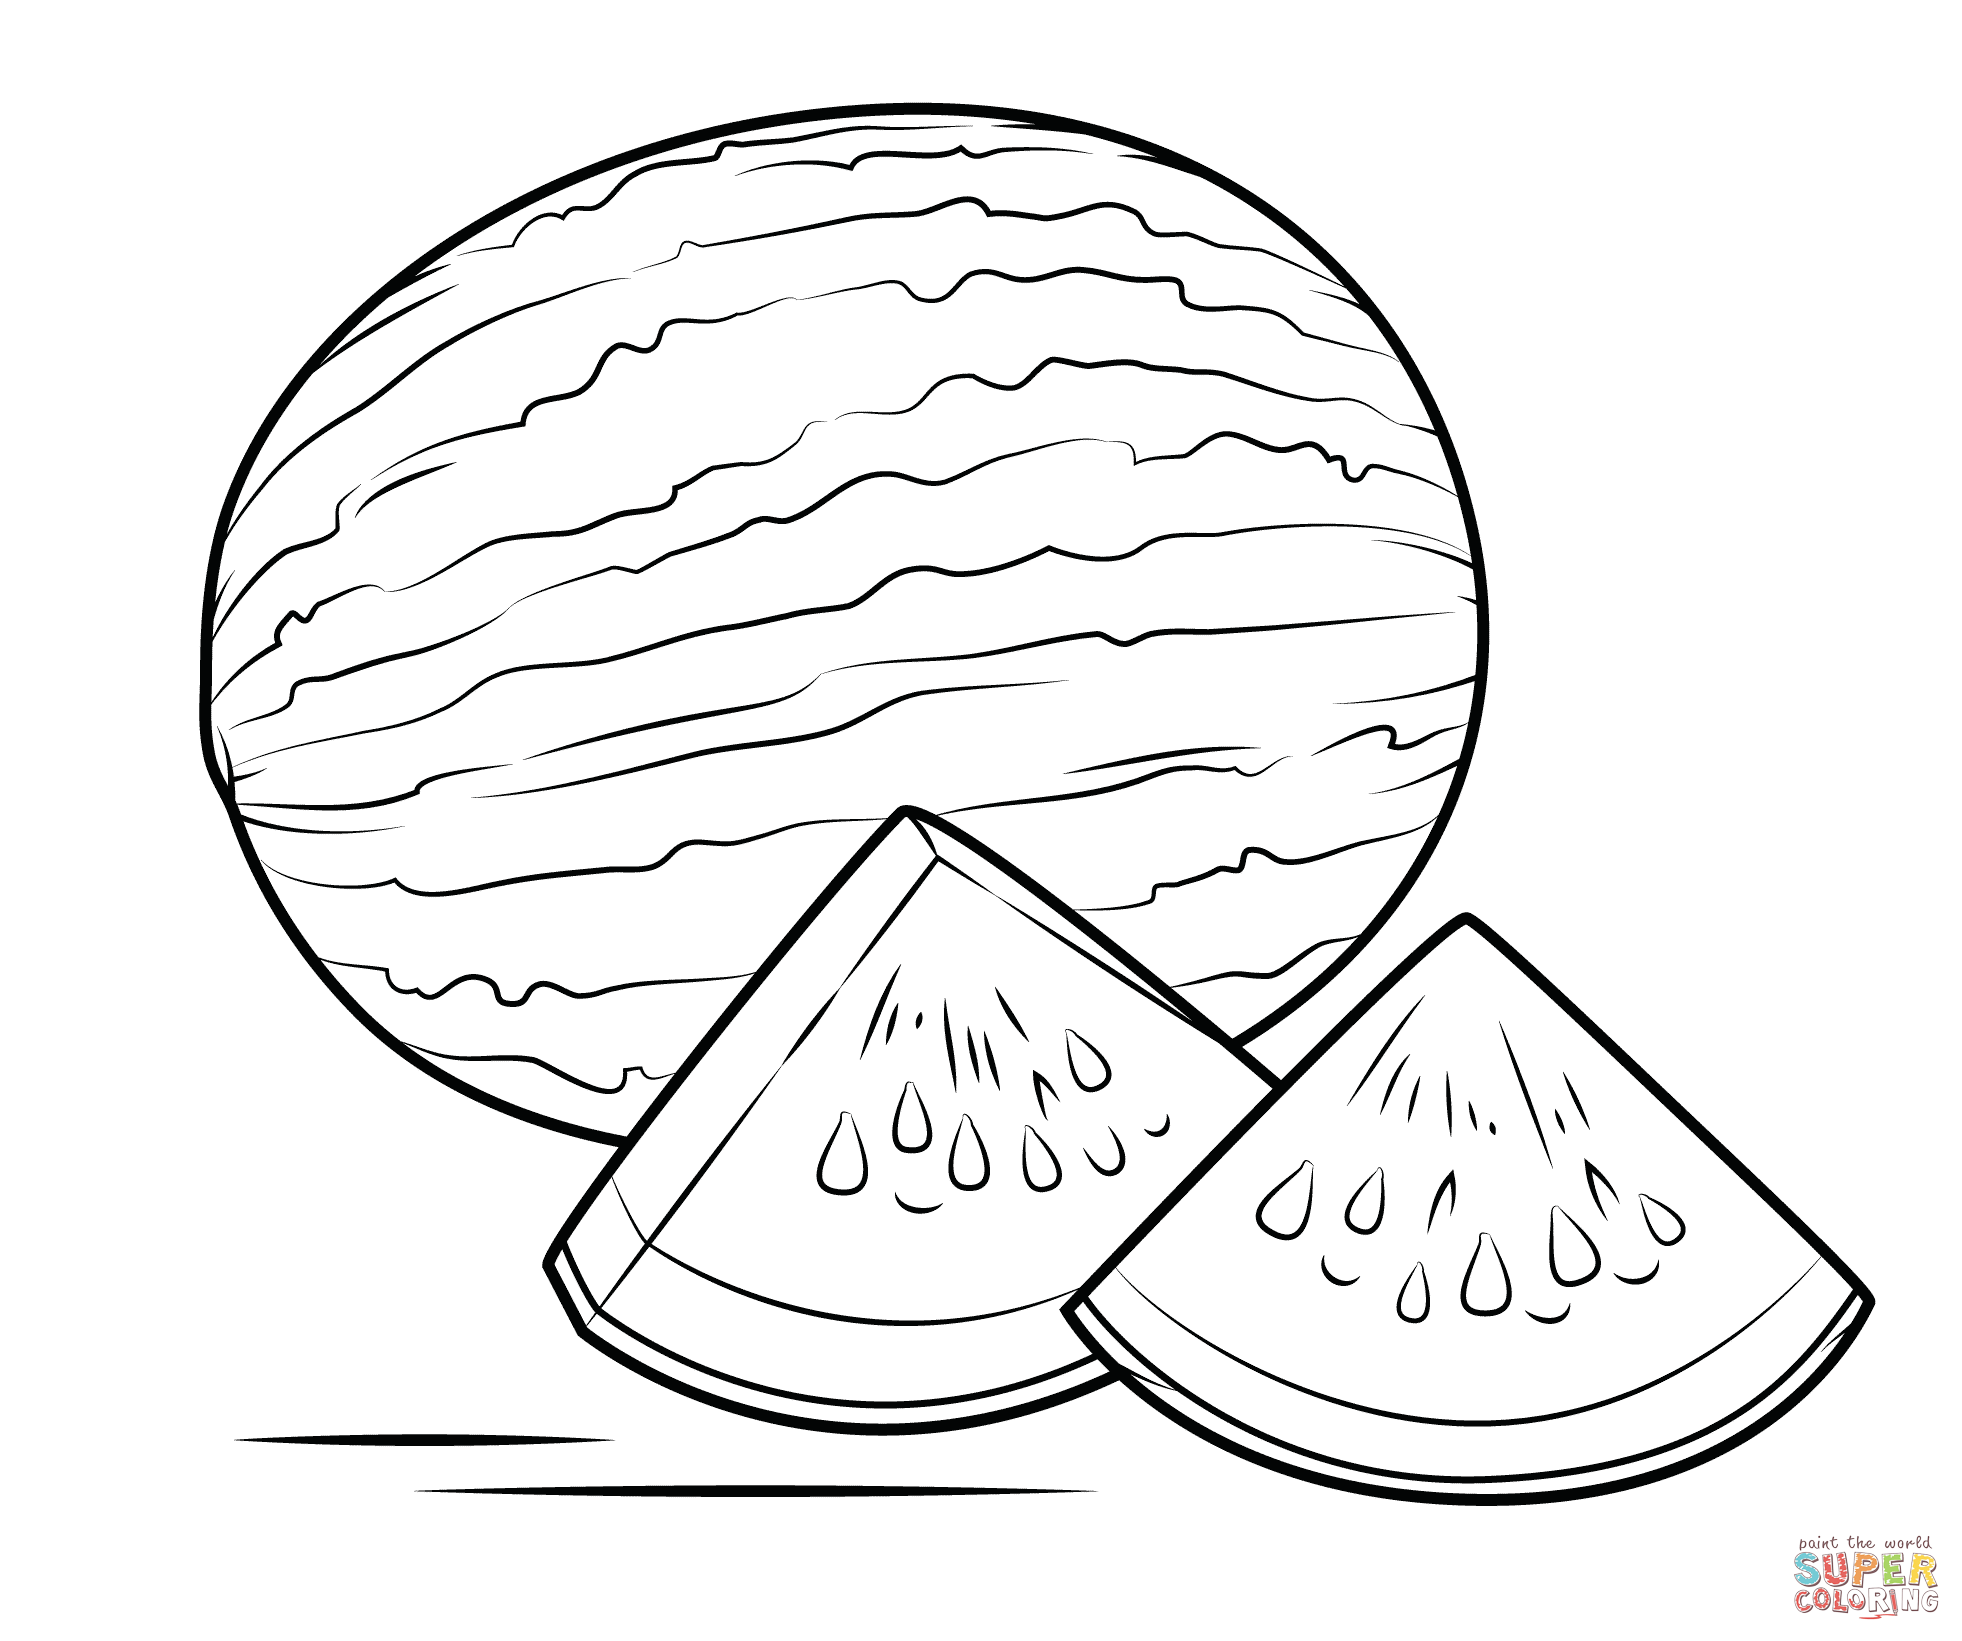 Watermelon coloring #8, Download drawings